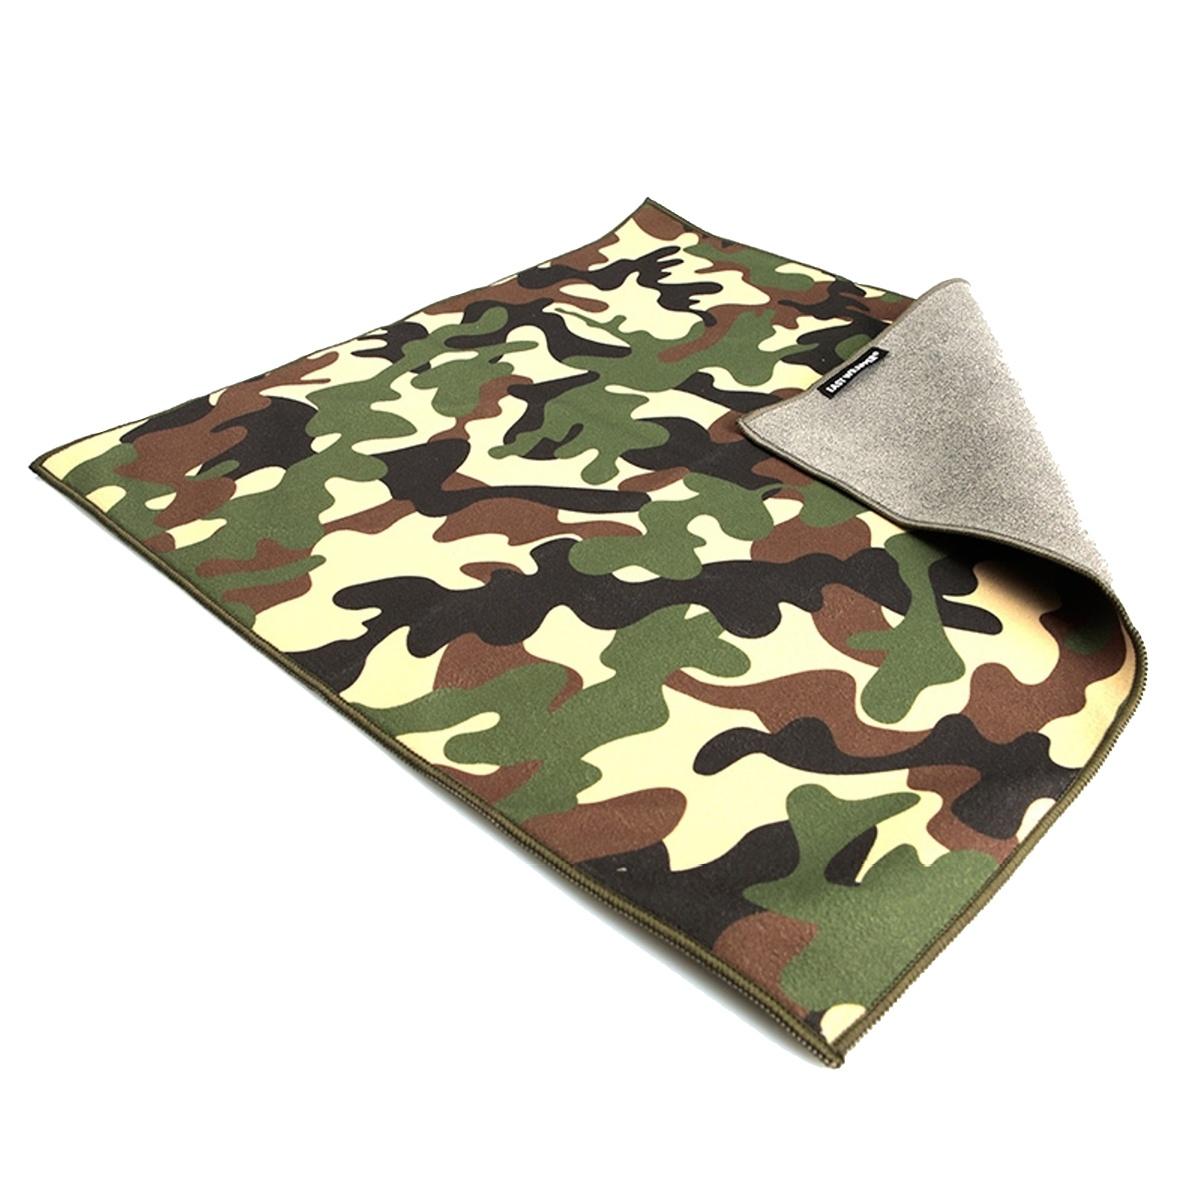 Einschlagtuch Easy Wrapper (XL) Camouflage